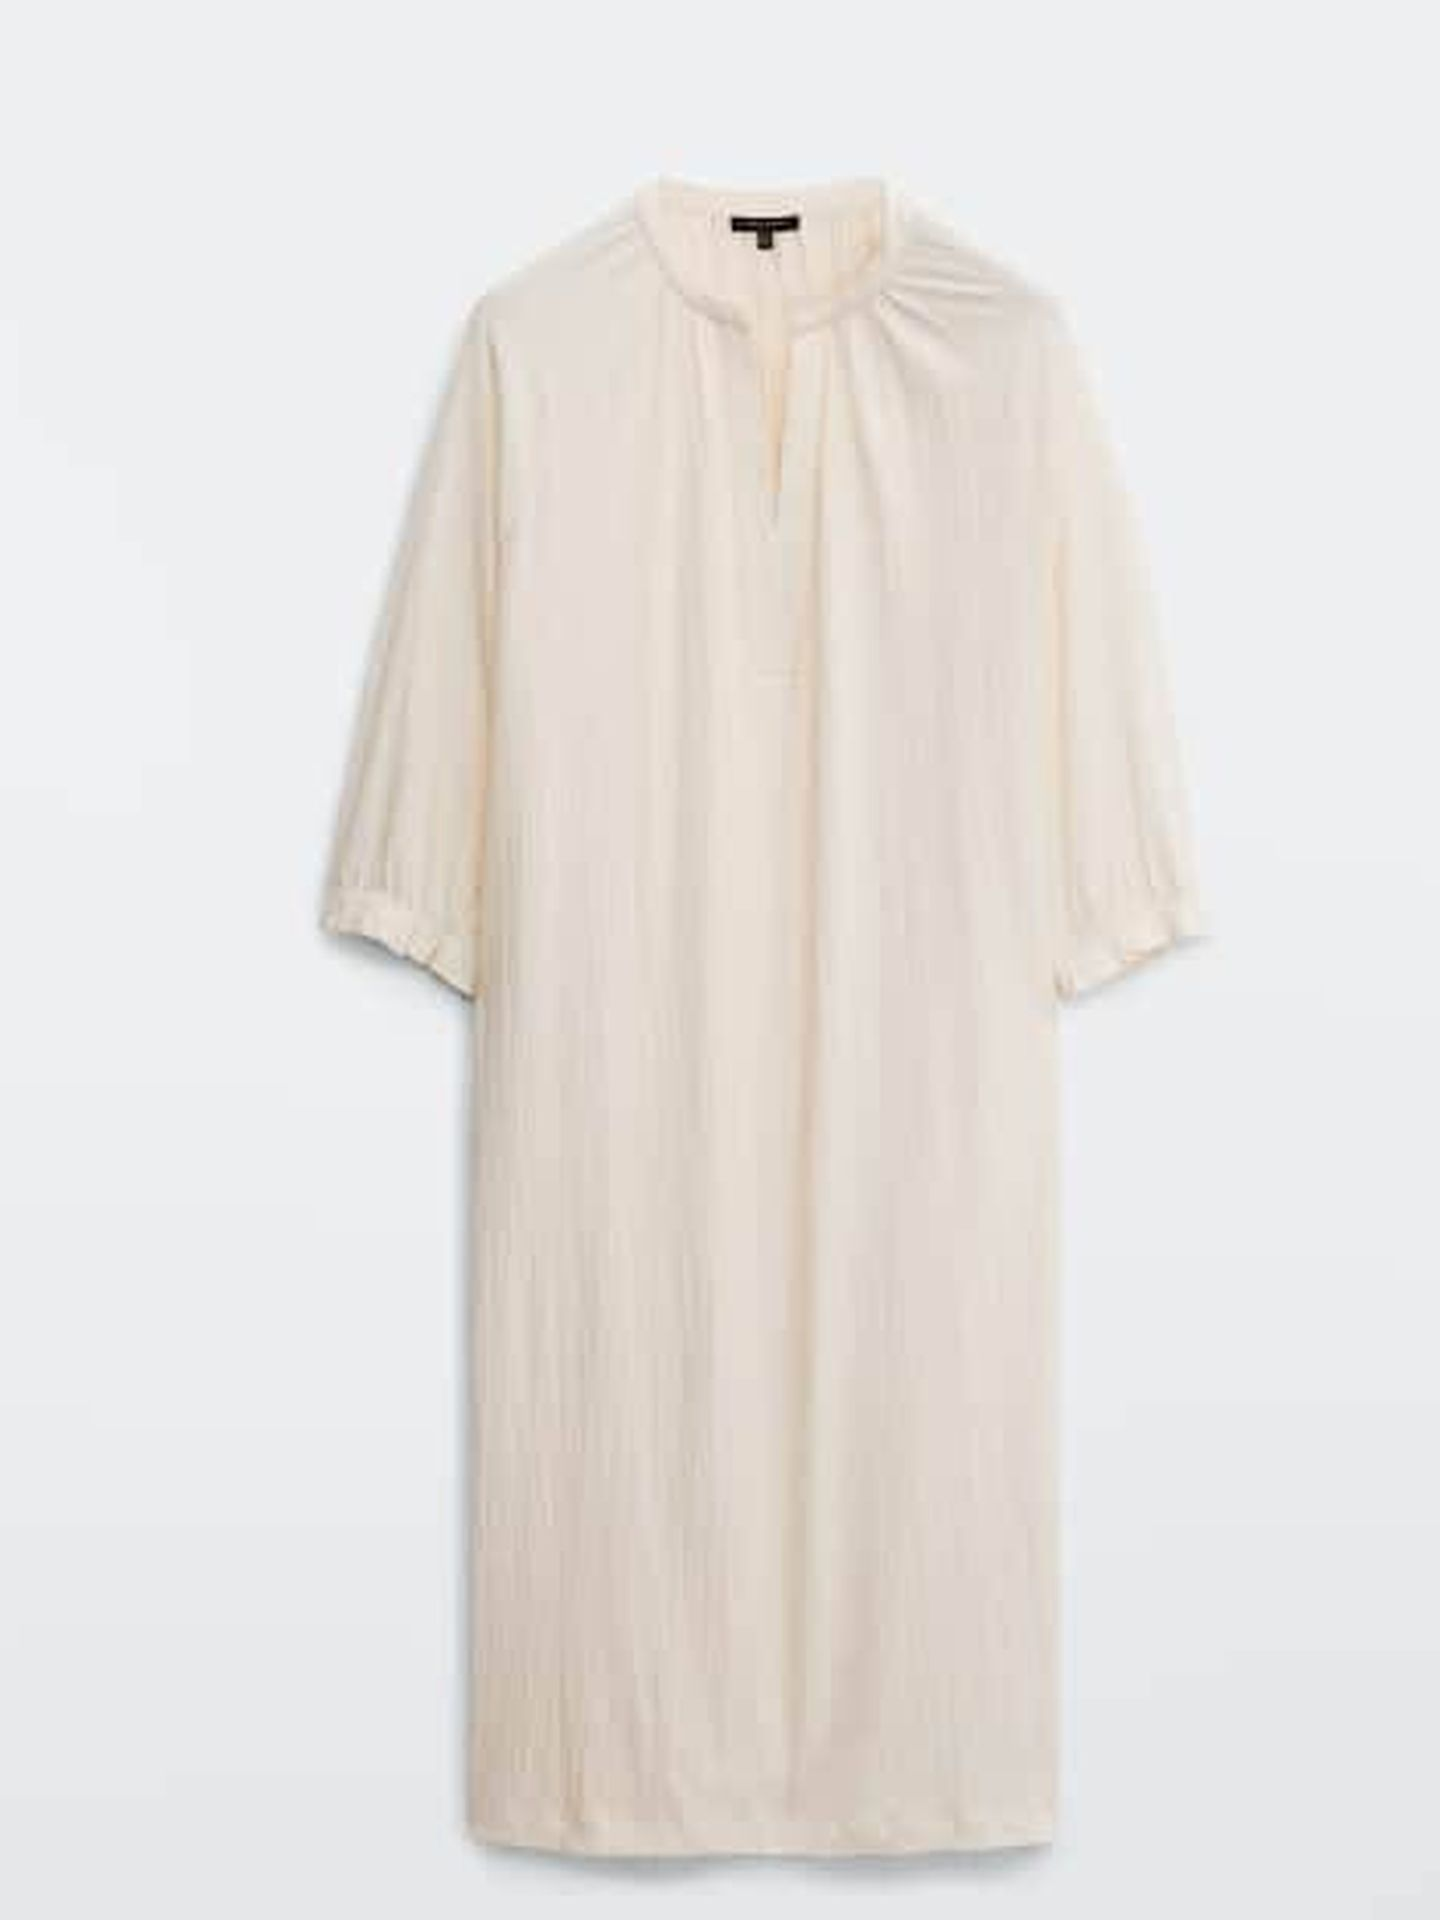 Vestido fluido de Massimo Dutti. (Cortesía)